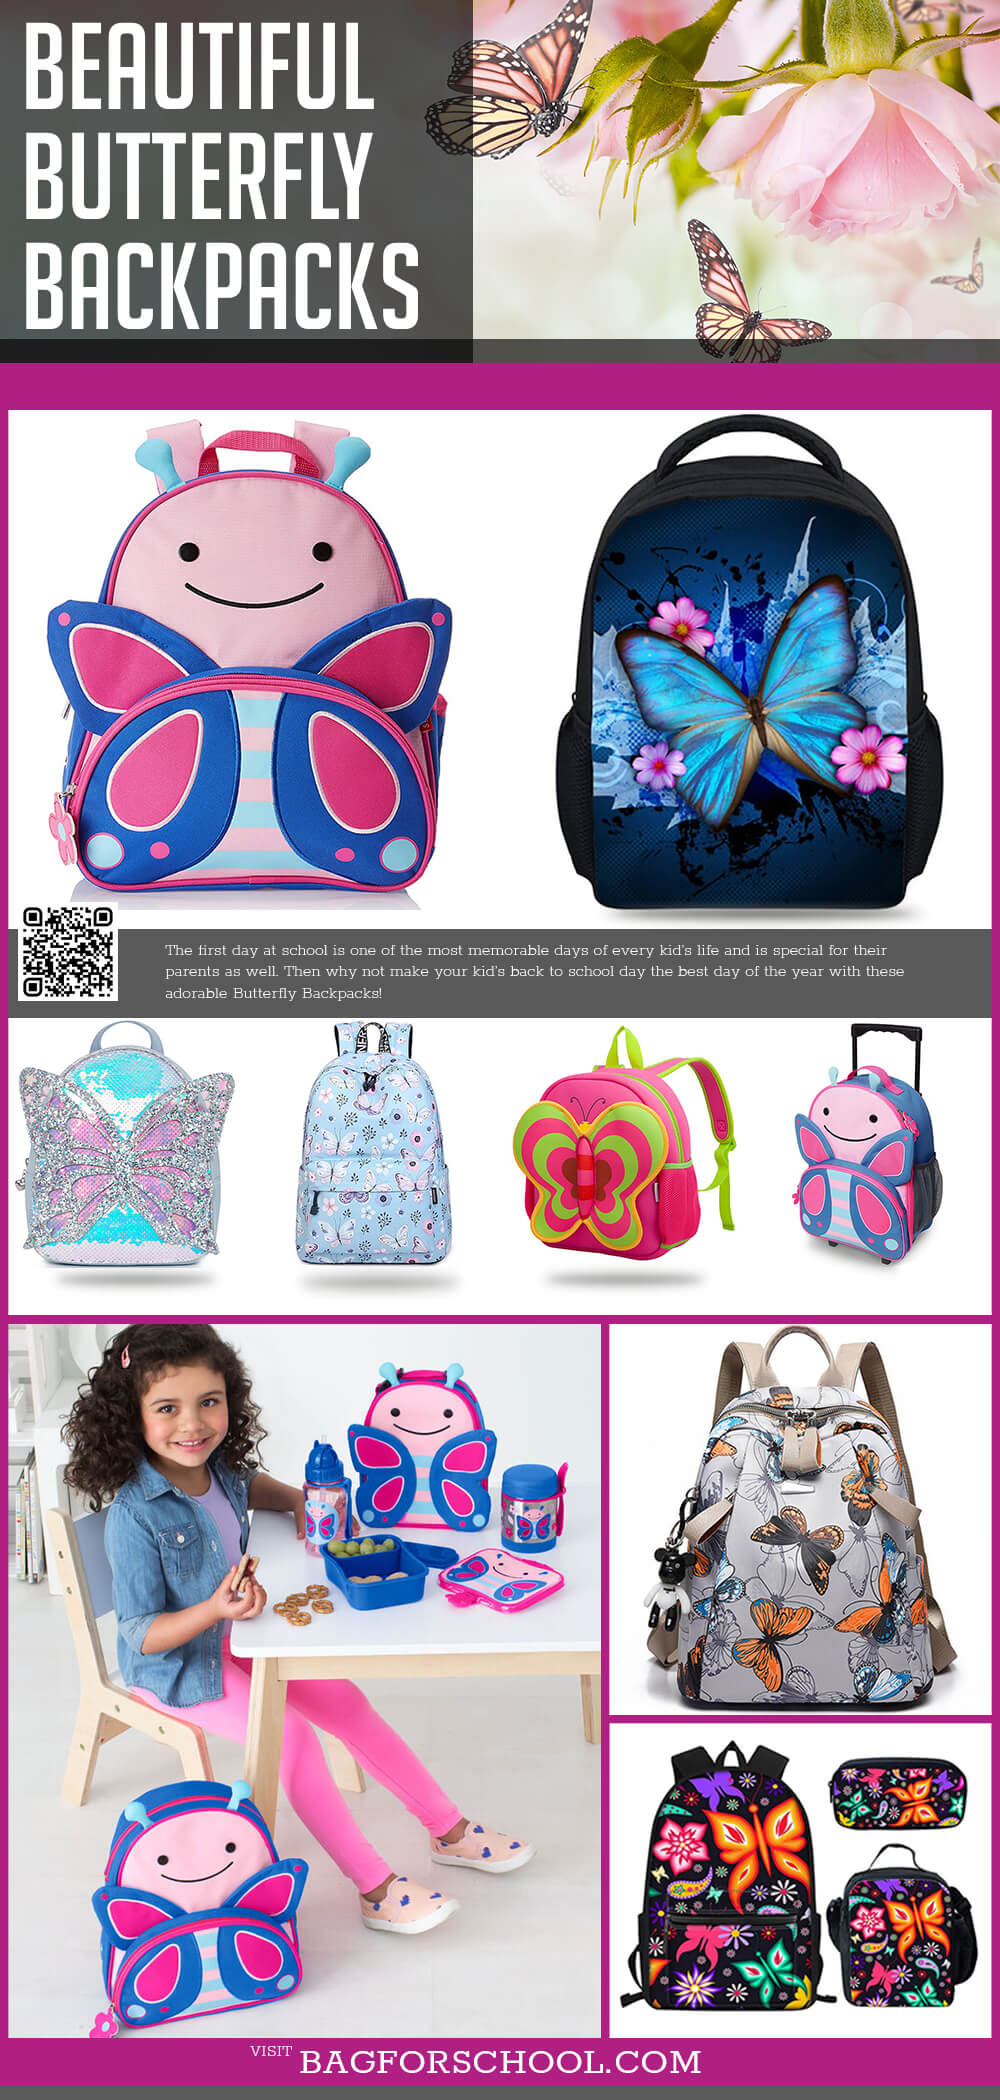 Butterfly Backpacks